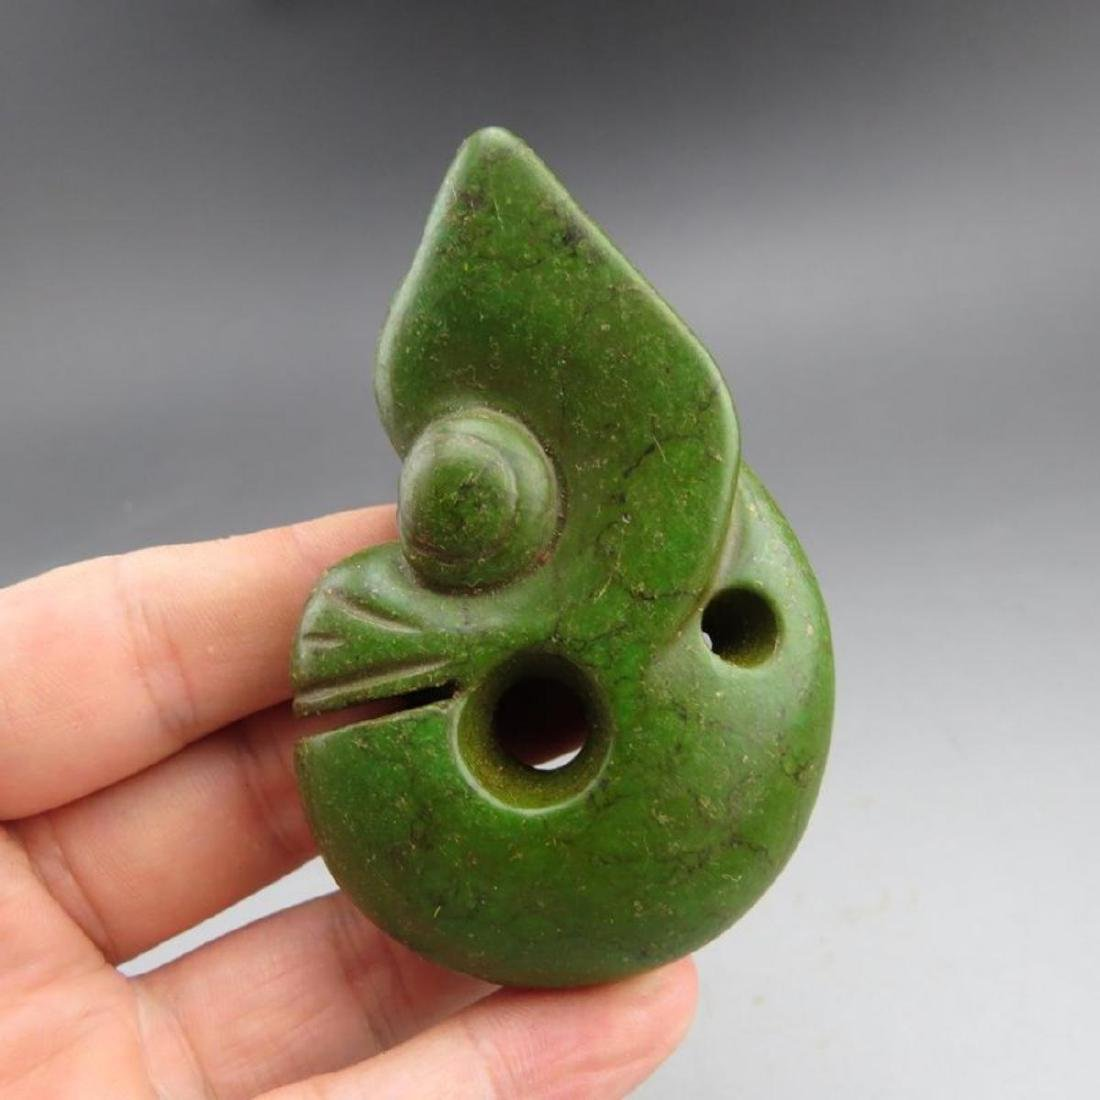 Antique Chinese Jade Hongshan Pig Dragon Pendant - 3